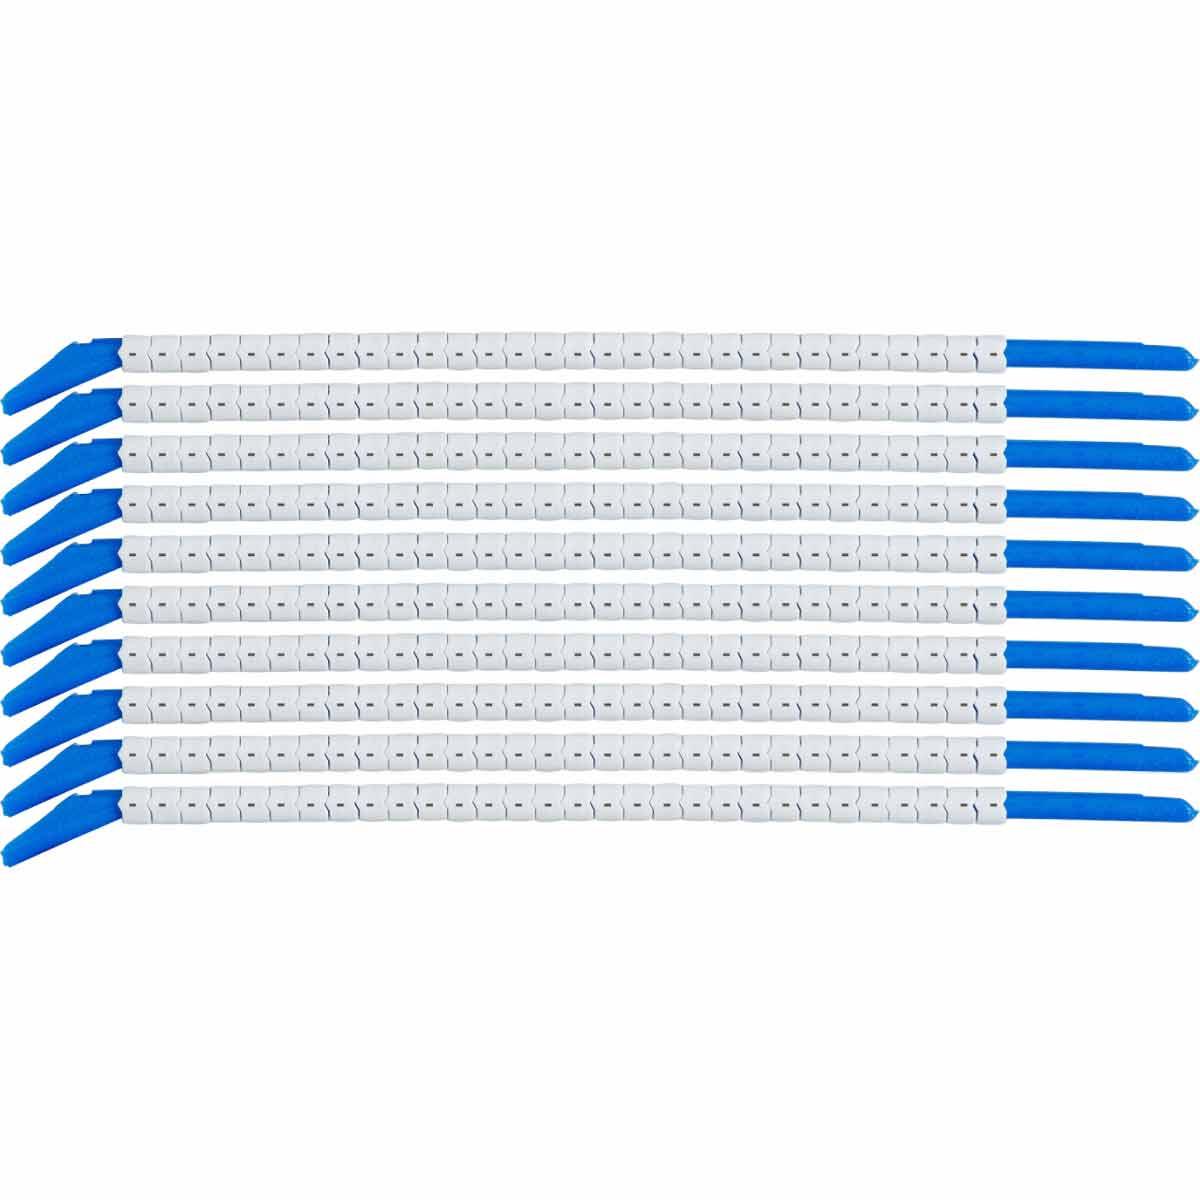 BRADY SCN13-MINUS Clip Sleeve &Wire Markers - Legend: -